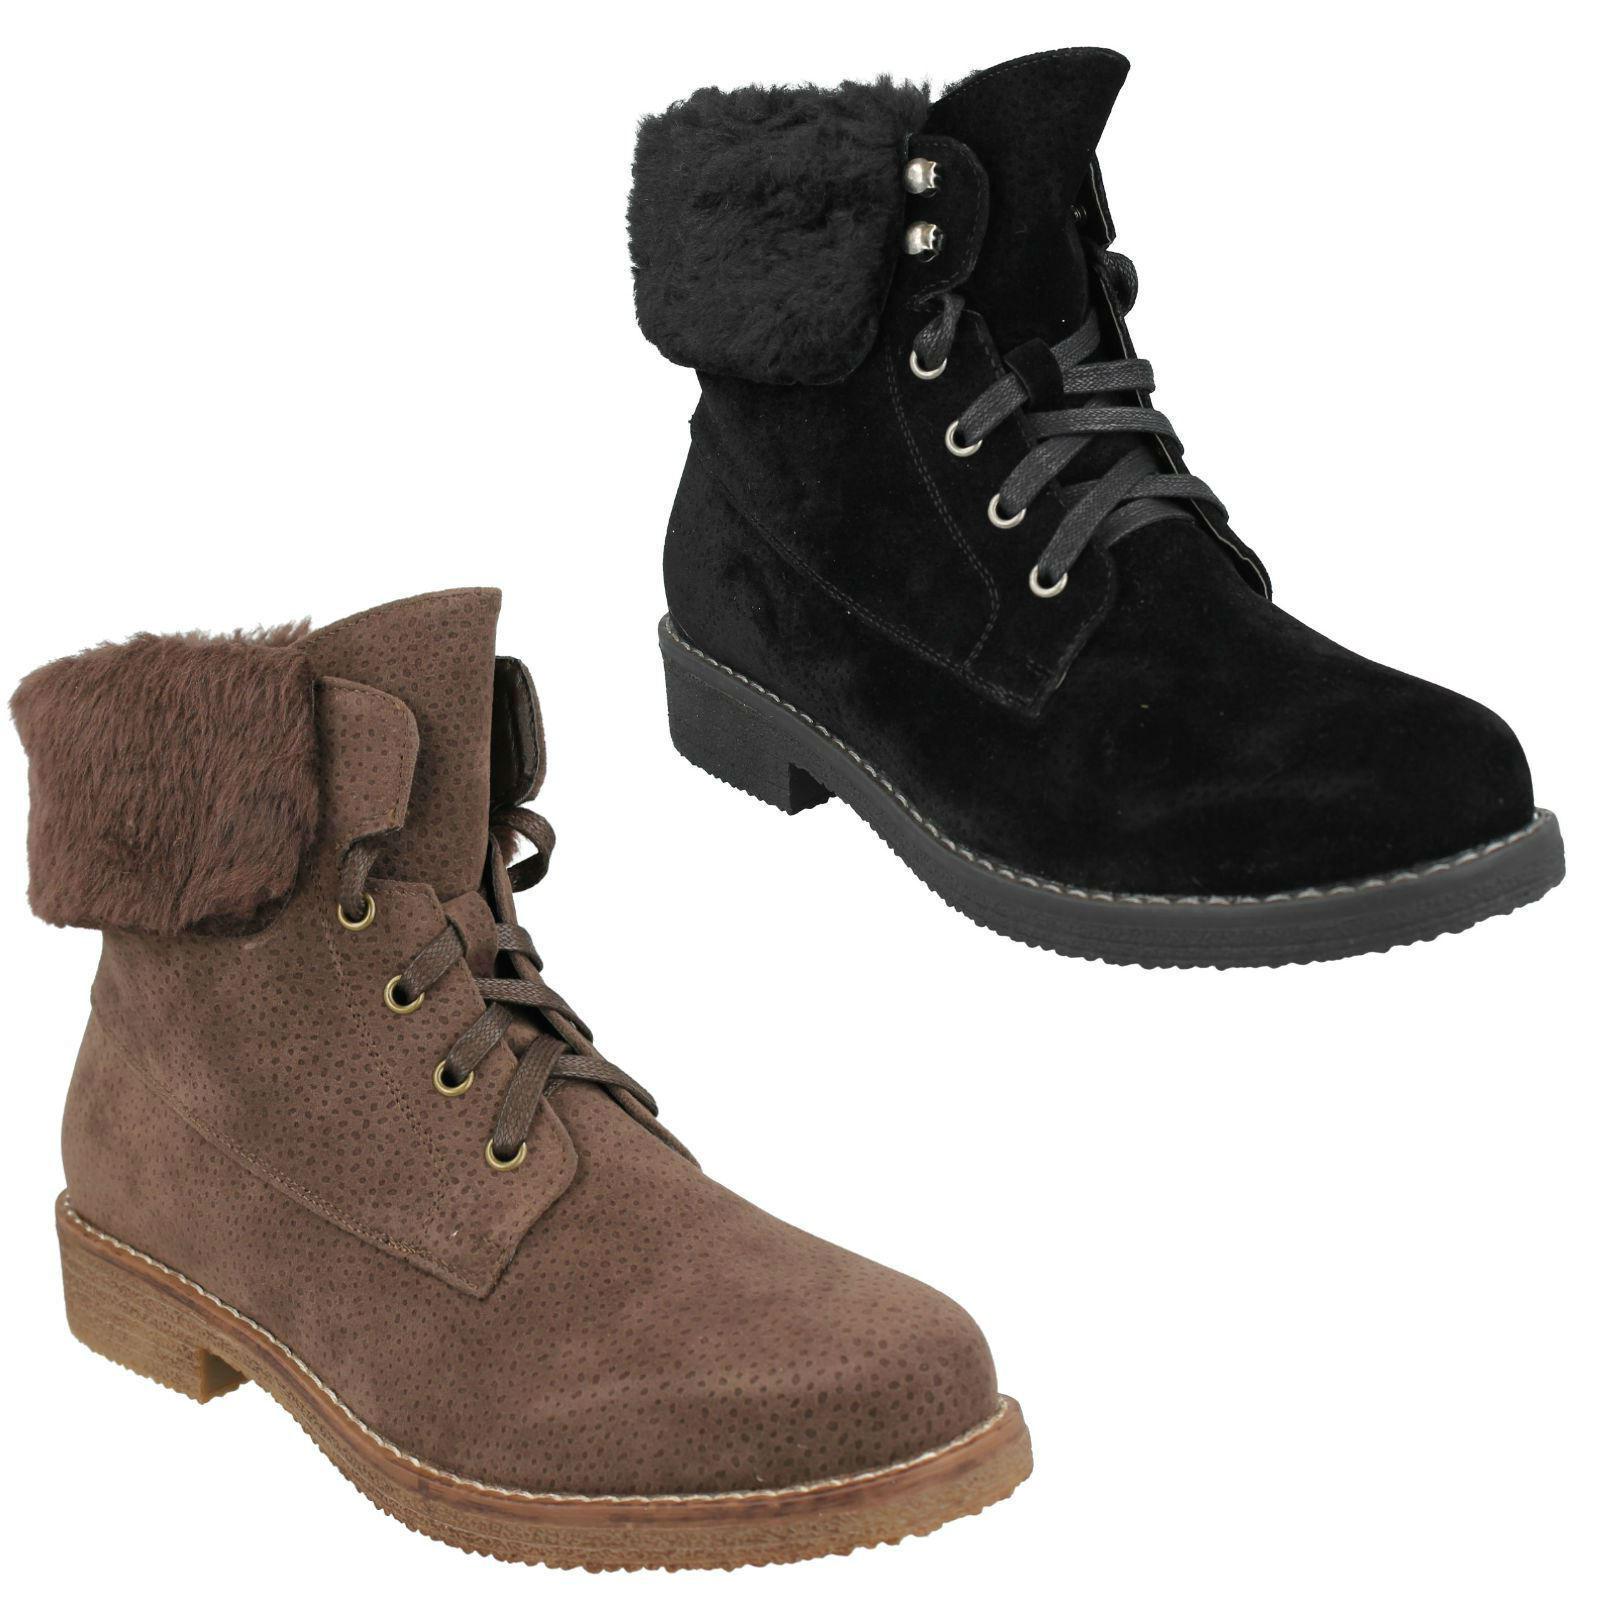 LADIES SPOT ON F50711 BLACK/BROWN LOW HEEL ZIP FUR COLLAR ANKLE WINTER BOOTS